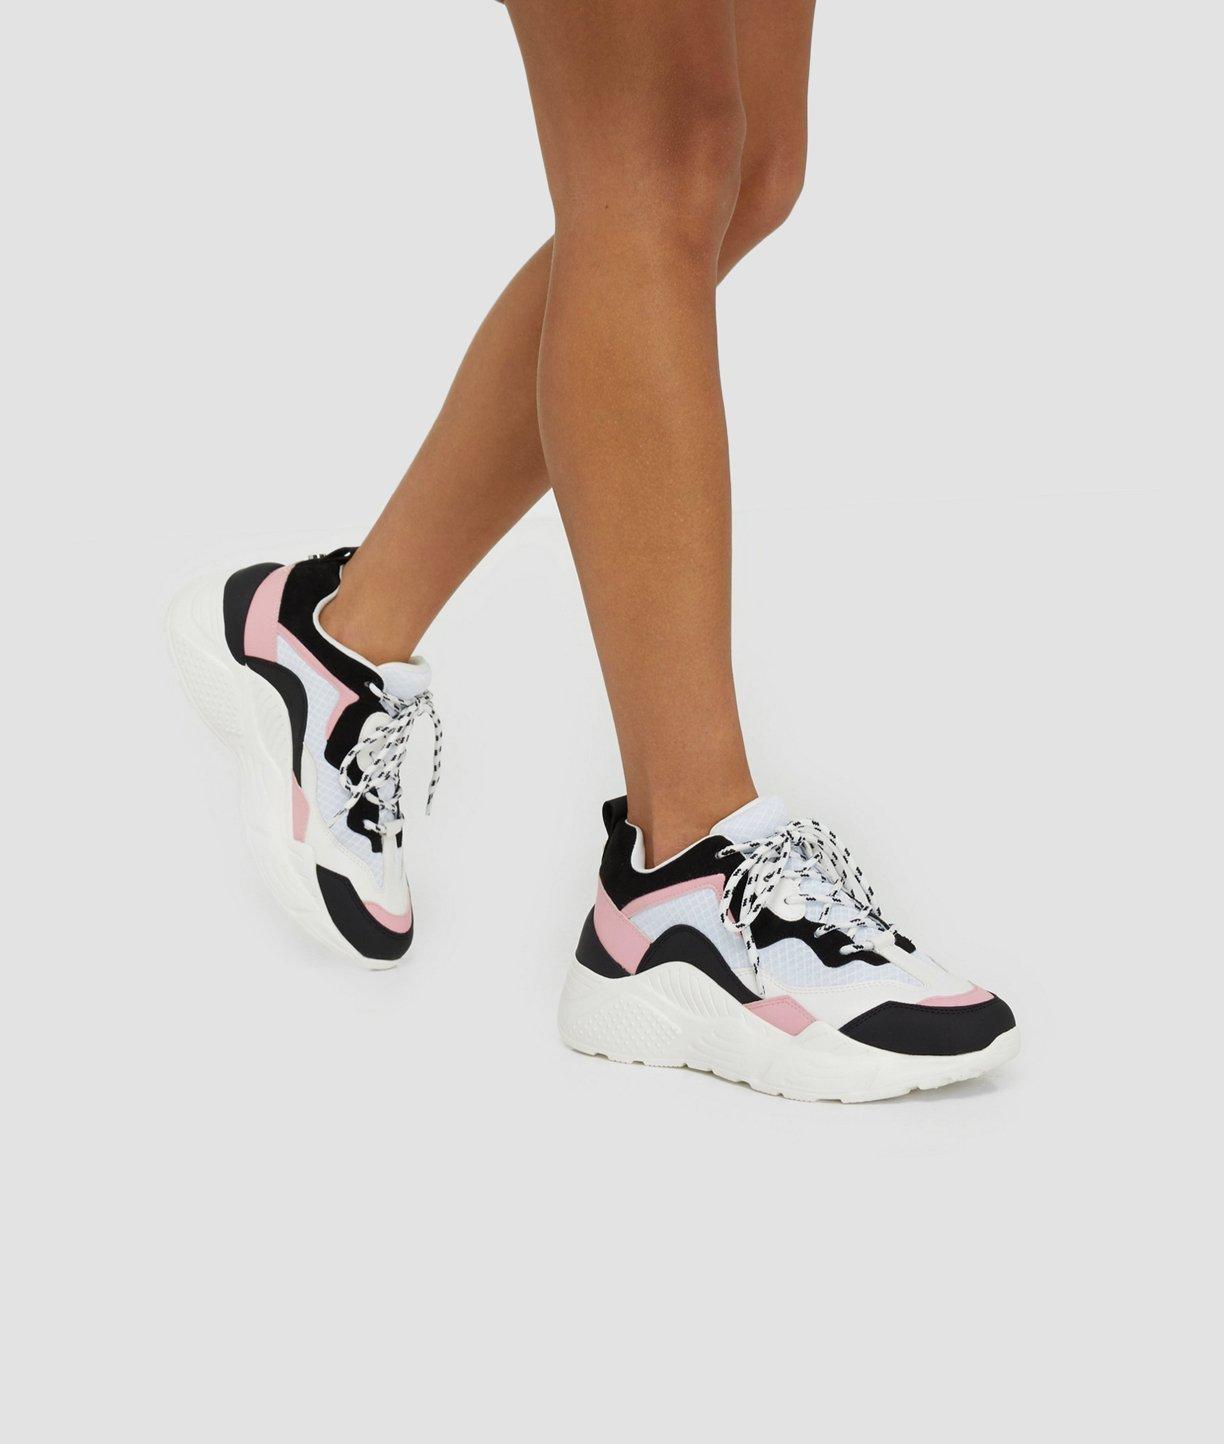 Sneakers SKOR kvinna online skor på nätet NELLY.COM